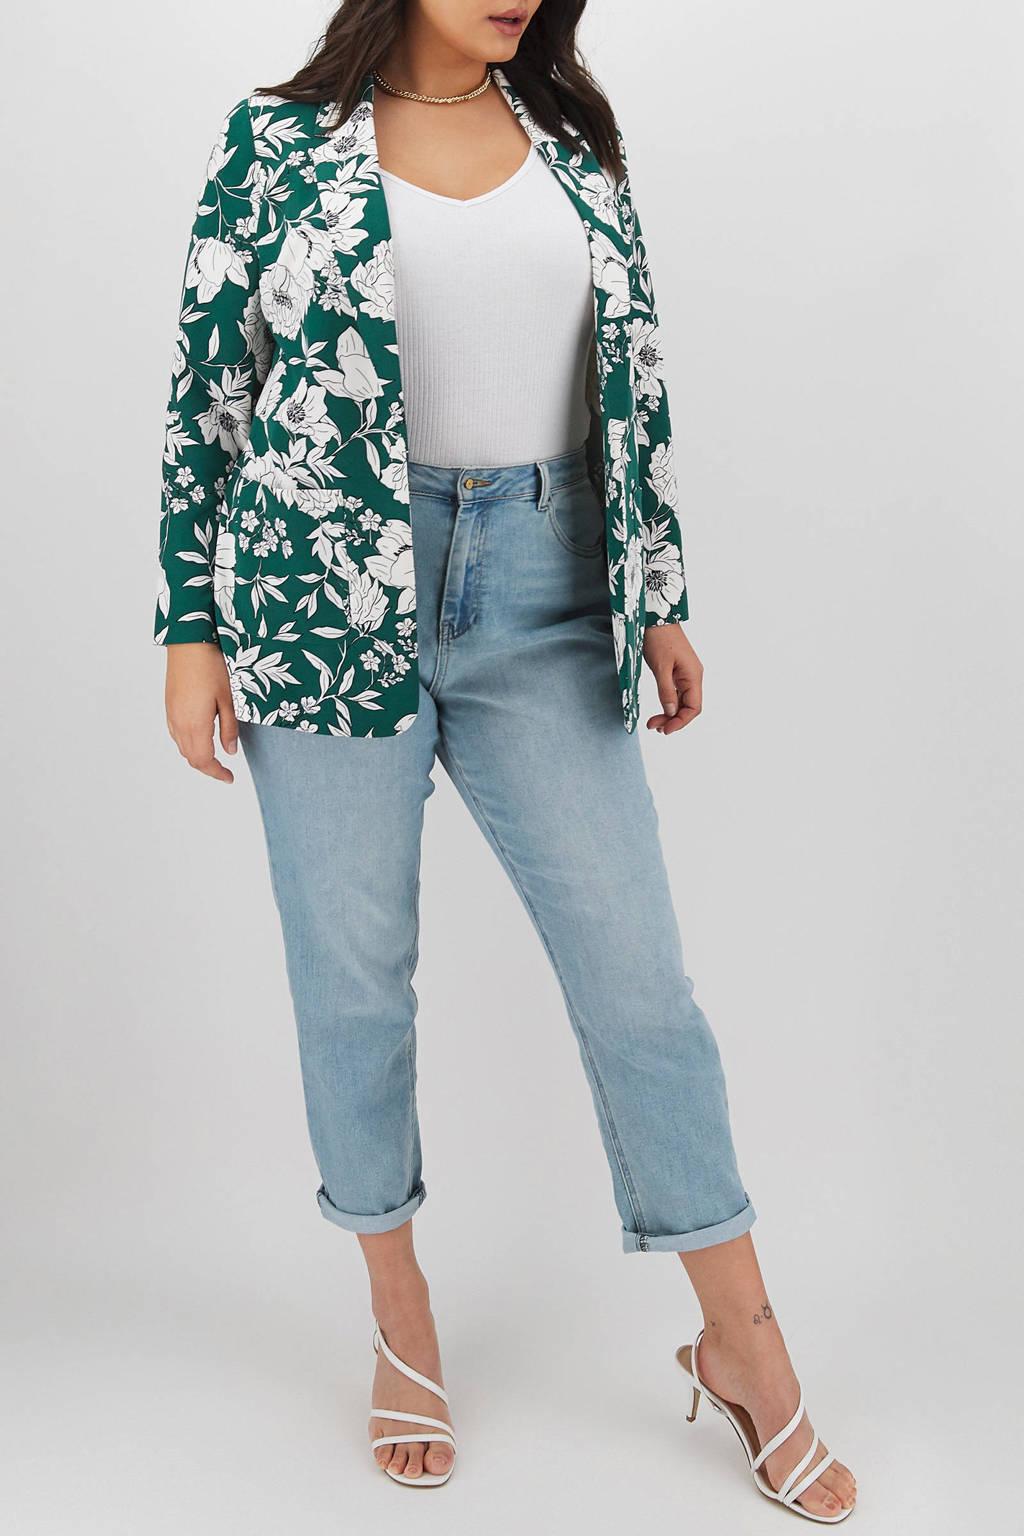 Simply Be Capsule gebloemde blazer groen/wit, Groen/wit